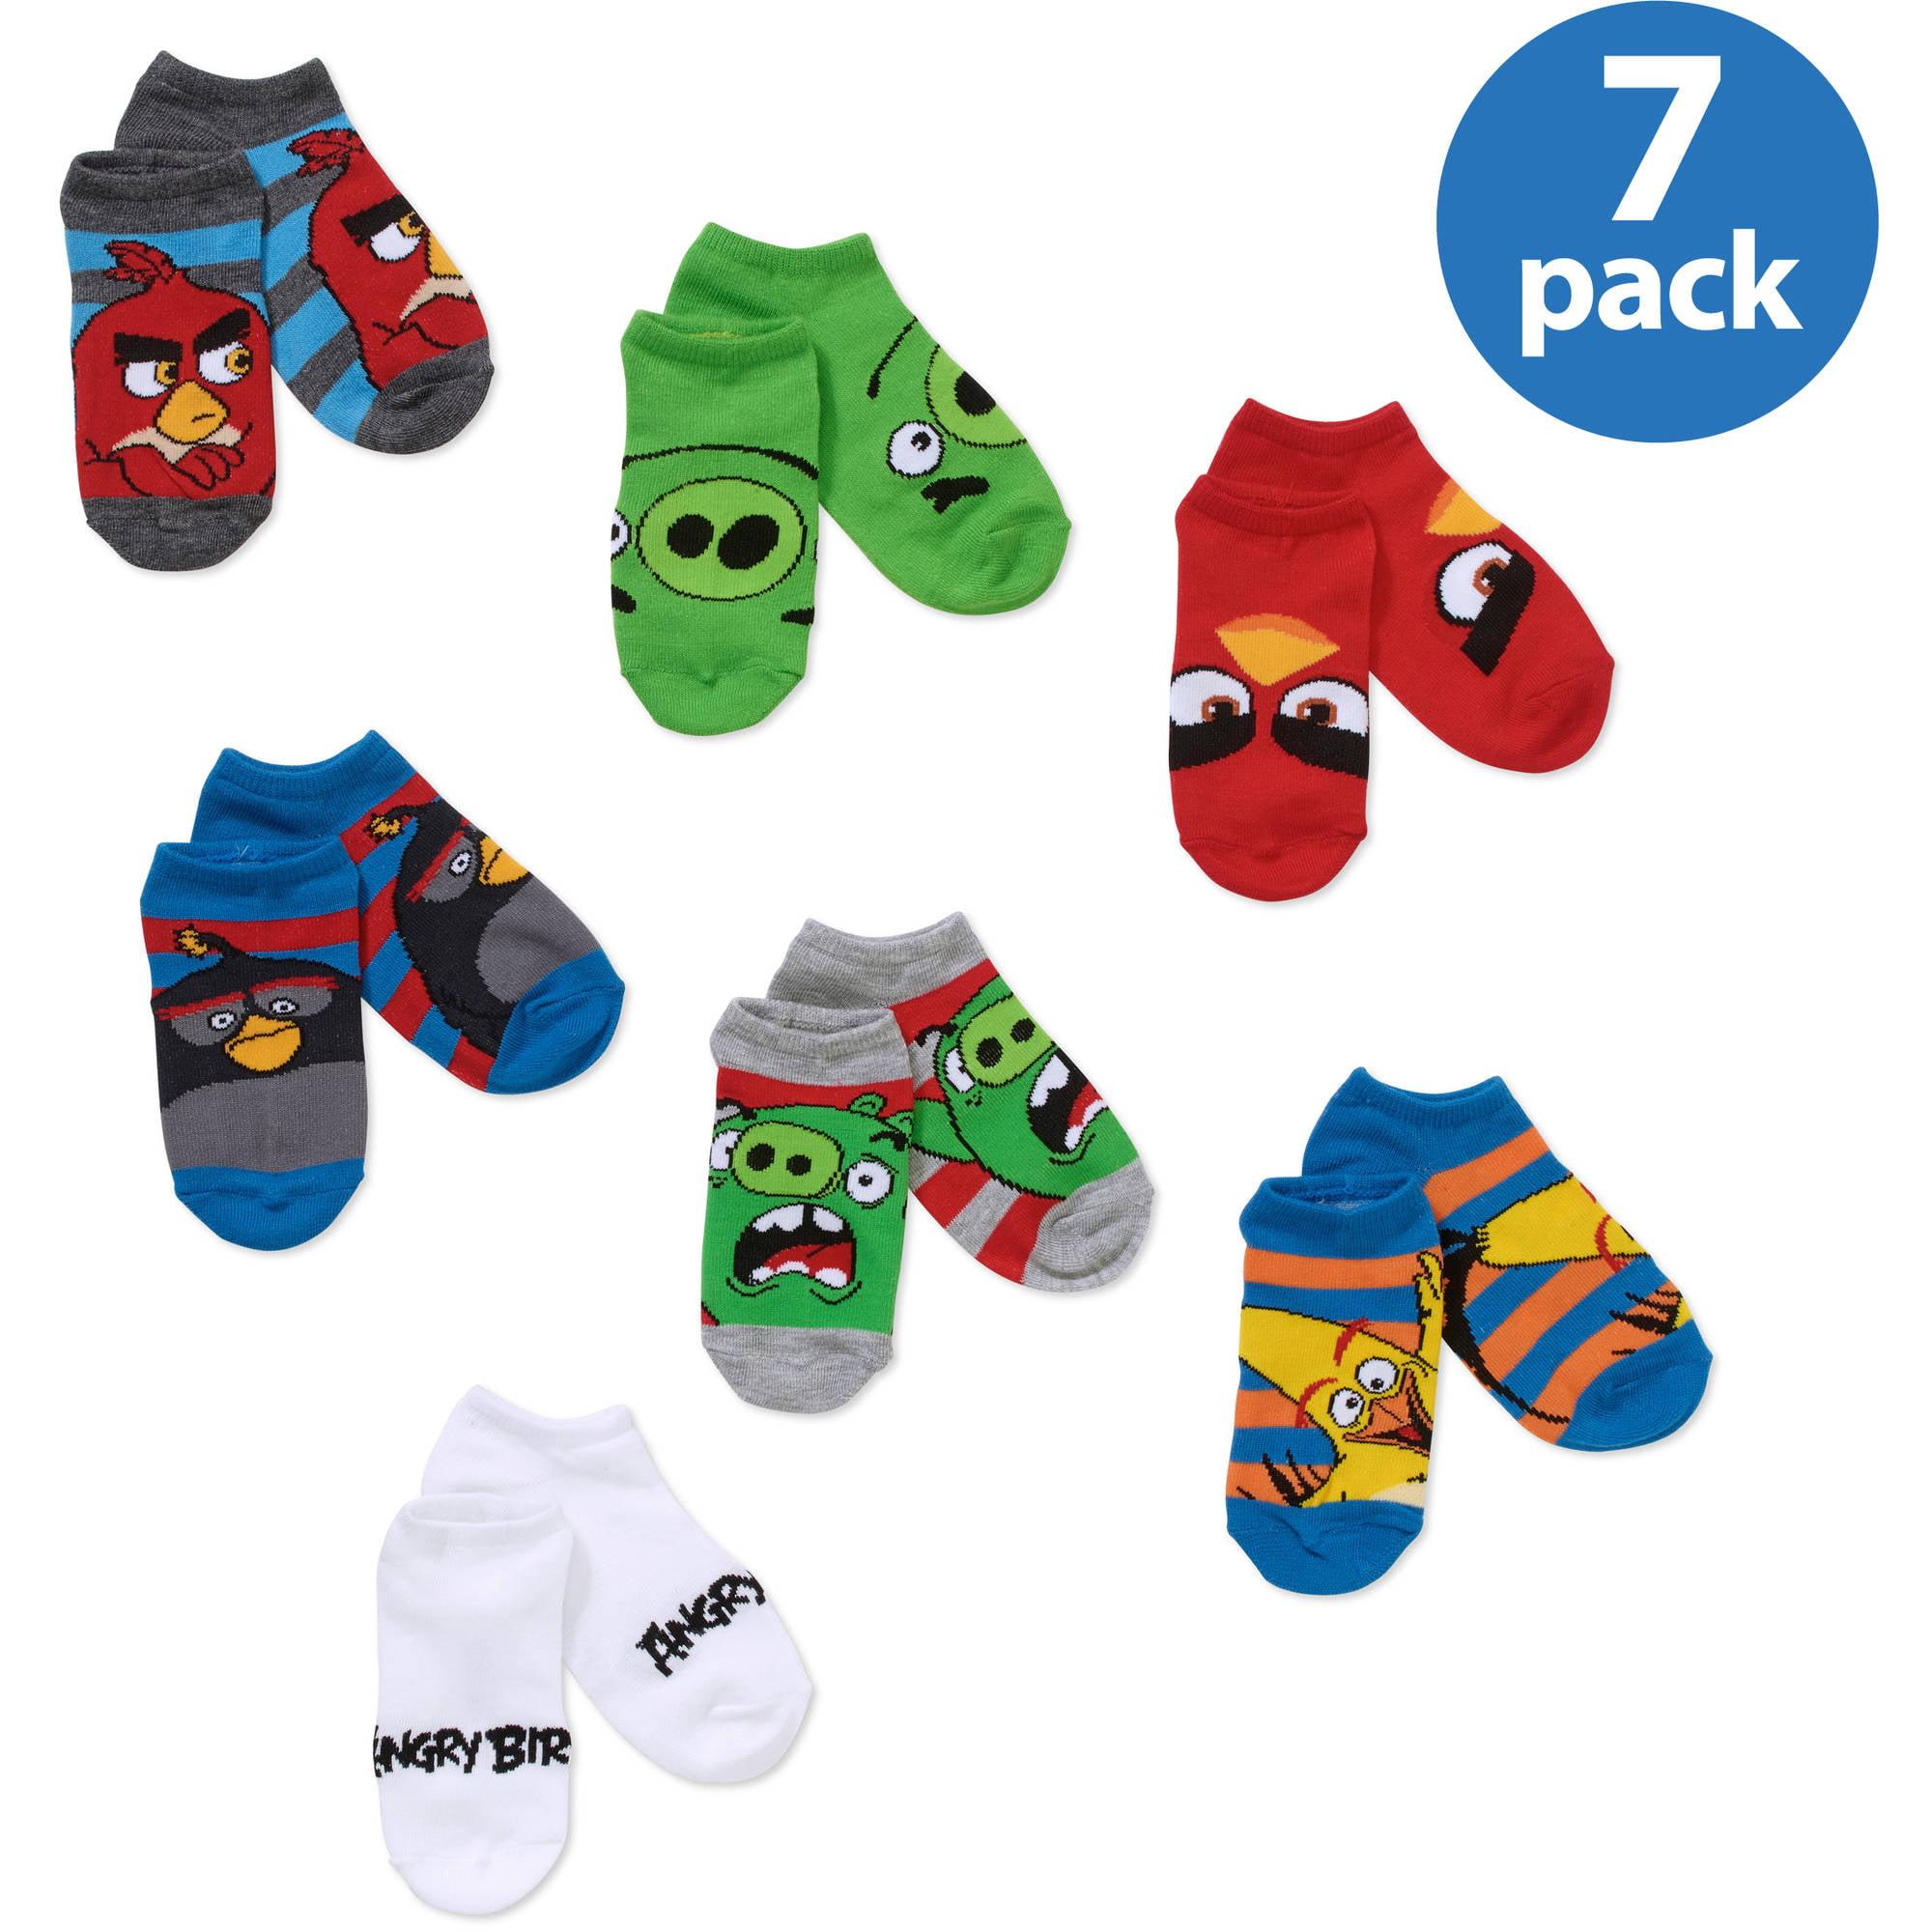 Angry Bird Boys' No Show Socks, 5 Pack + 2 Bonus Pairs